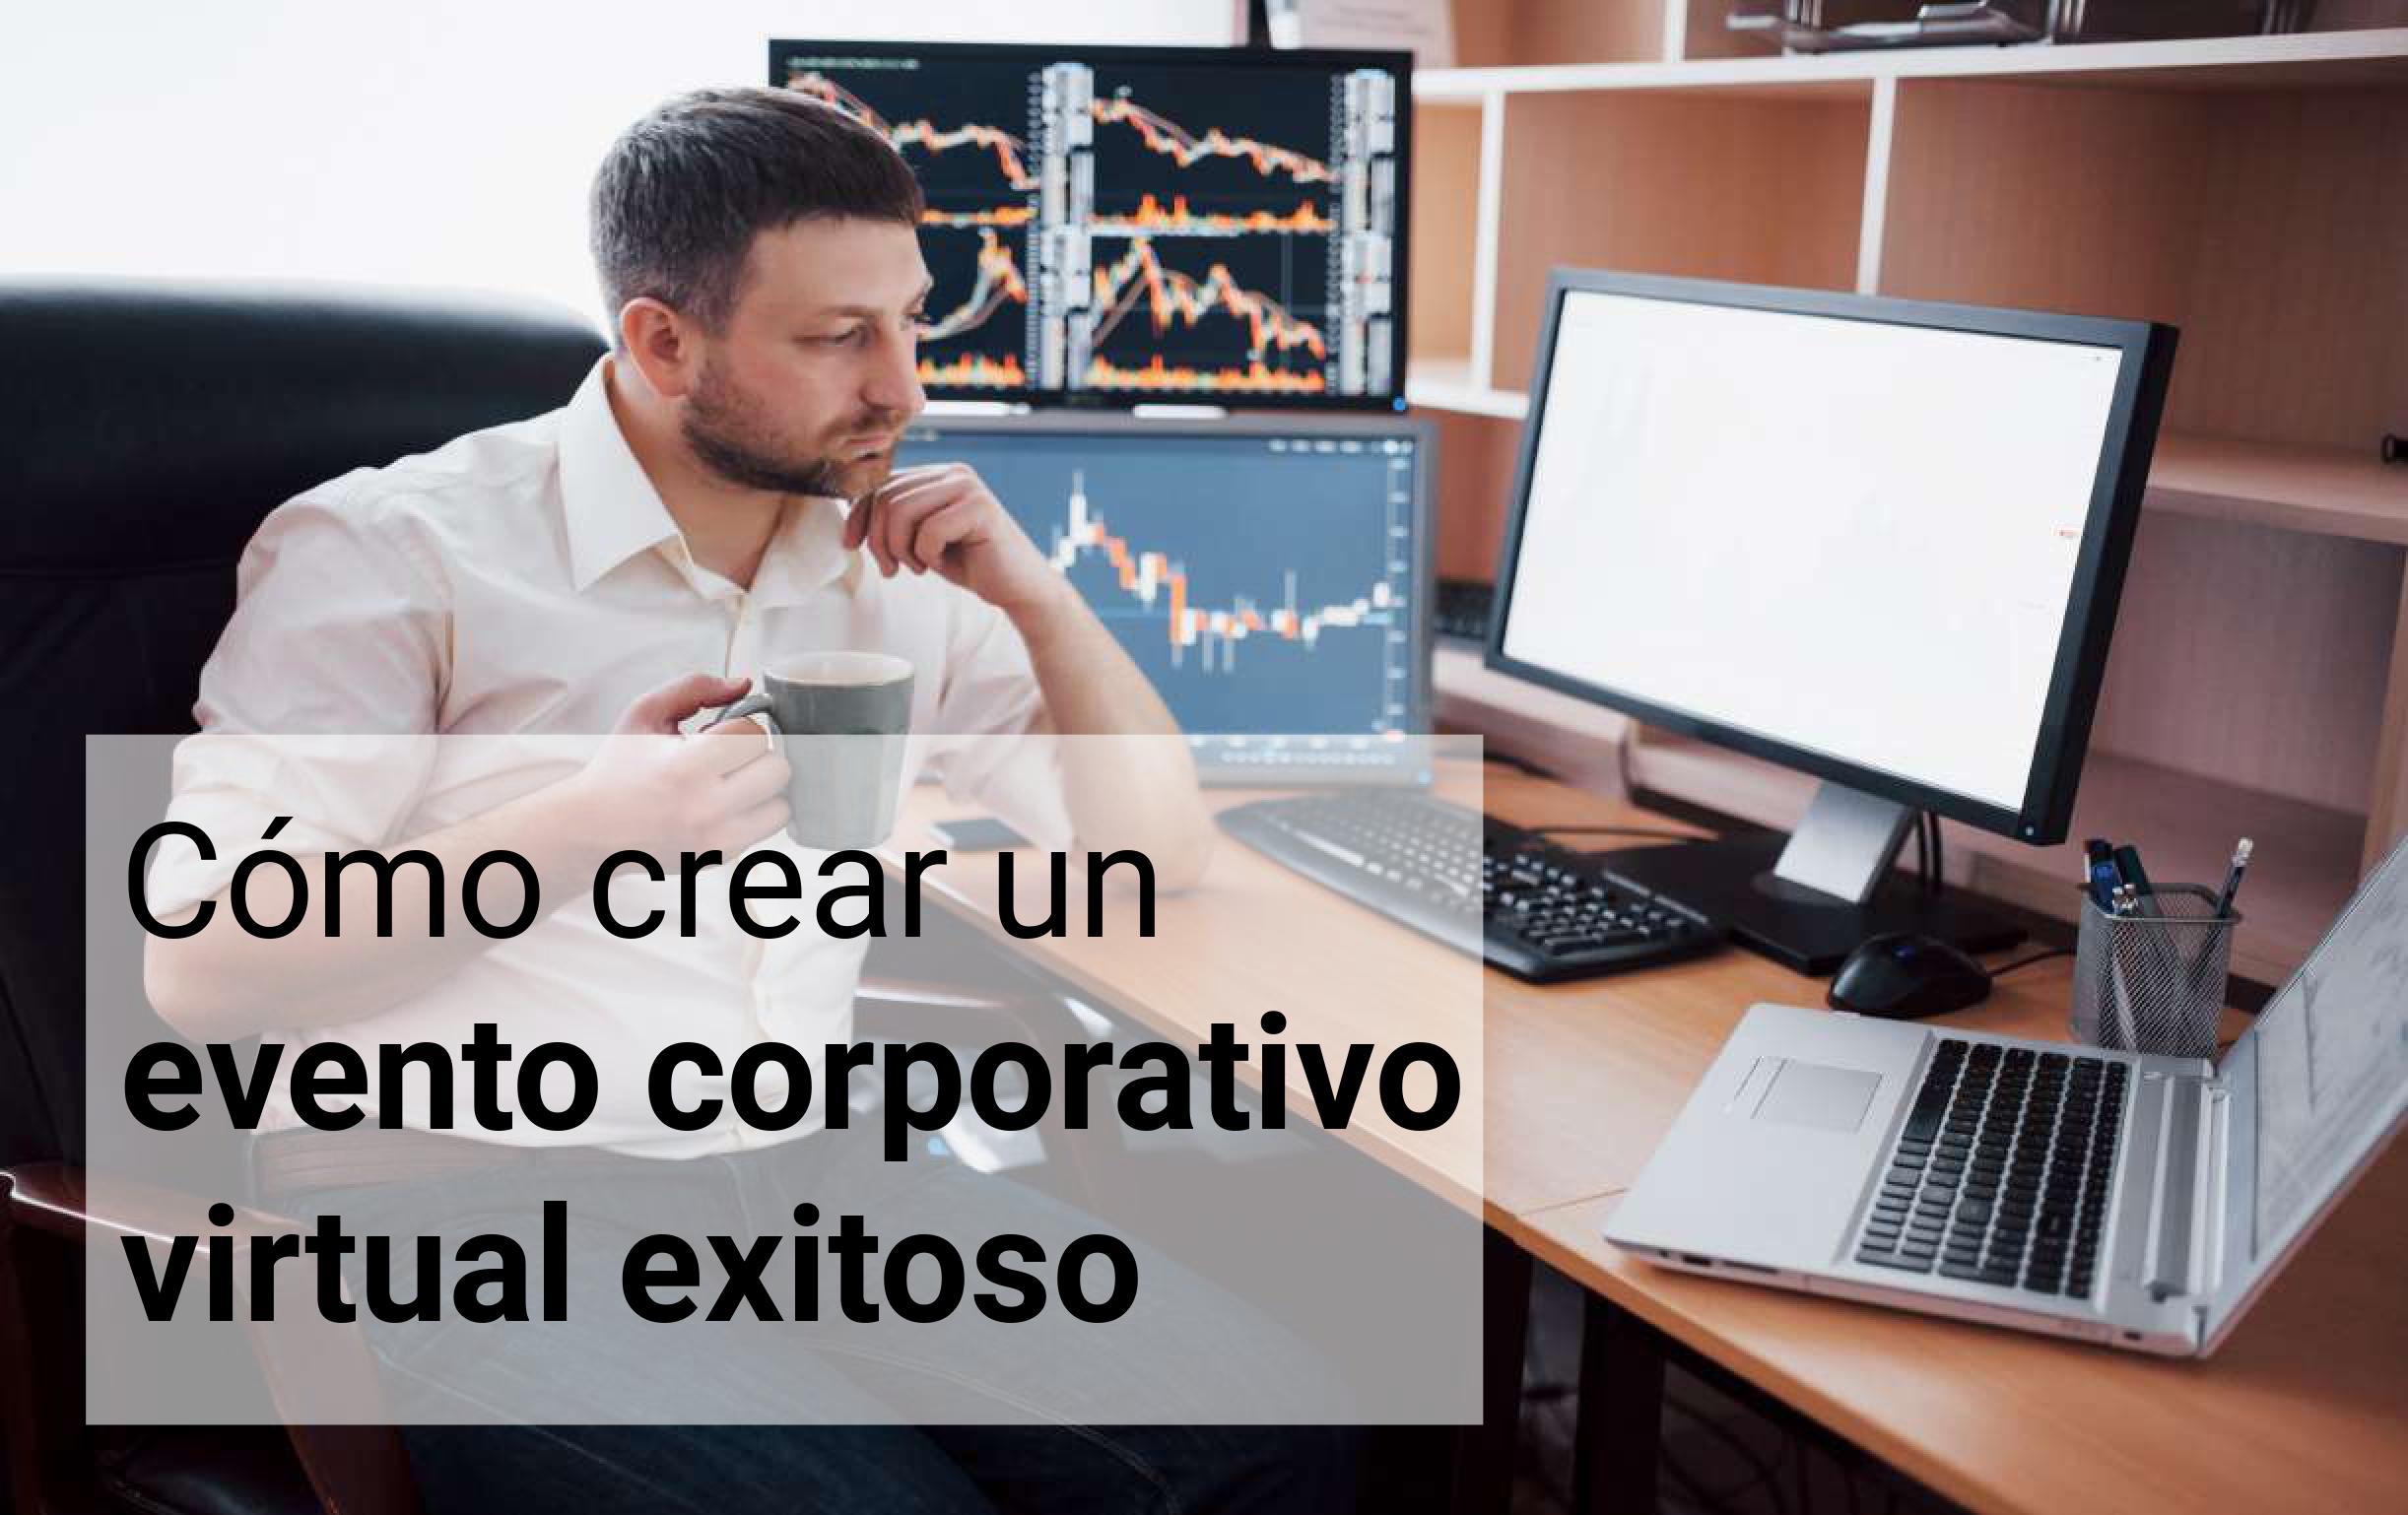 evento corporativo virtual